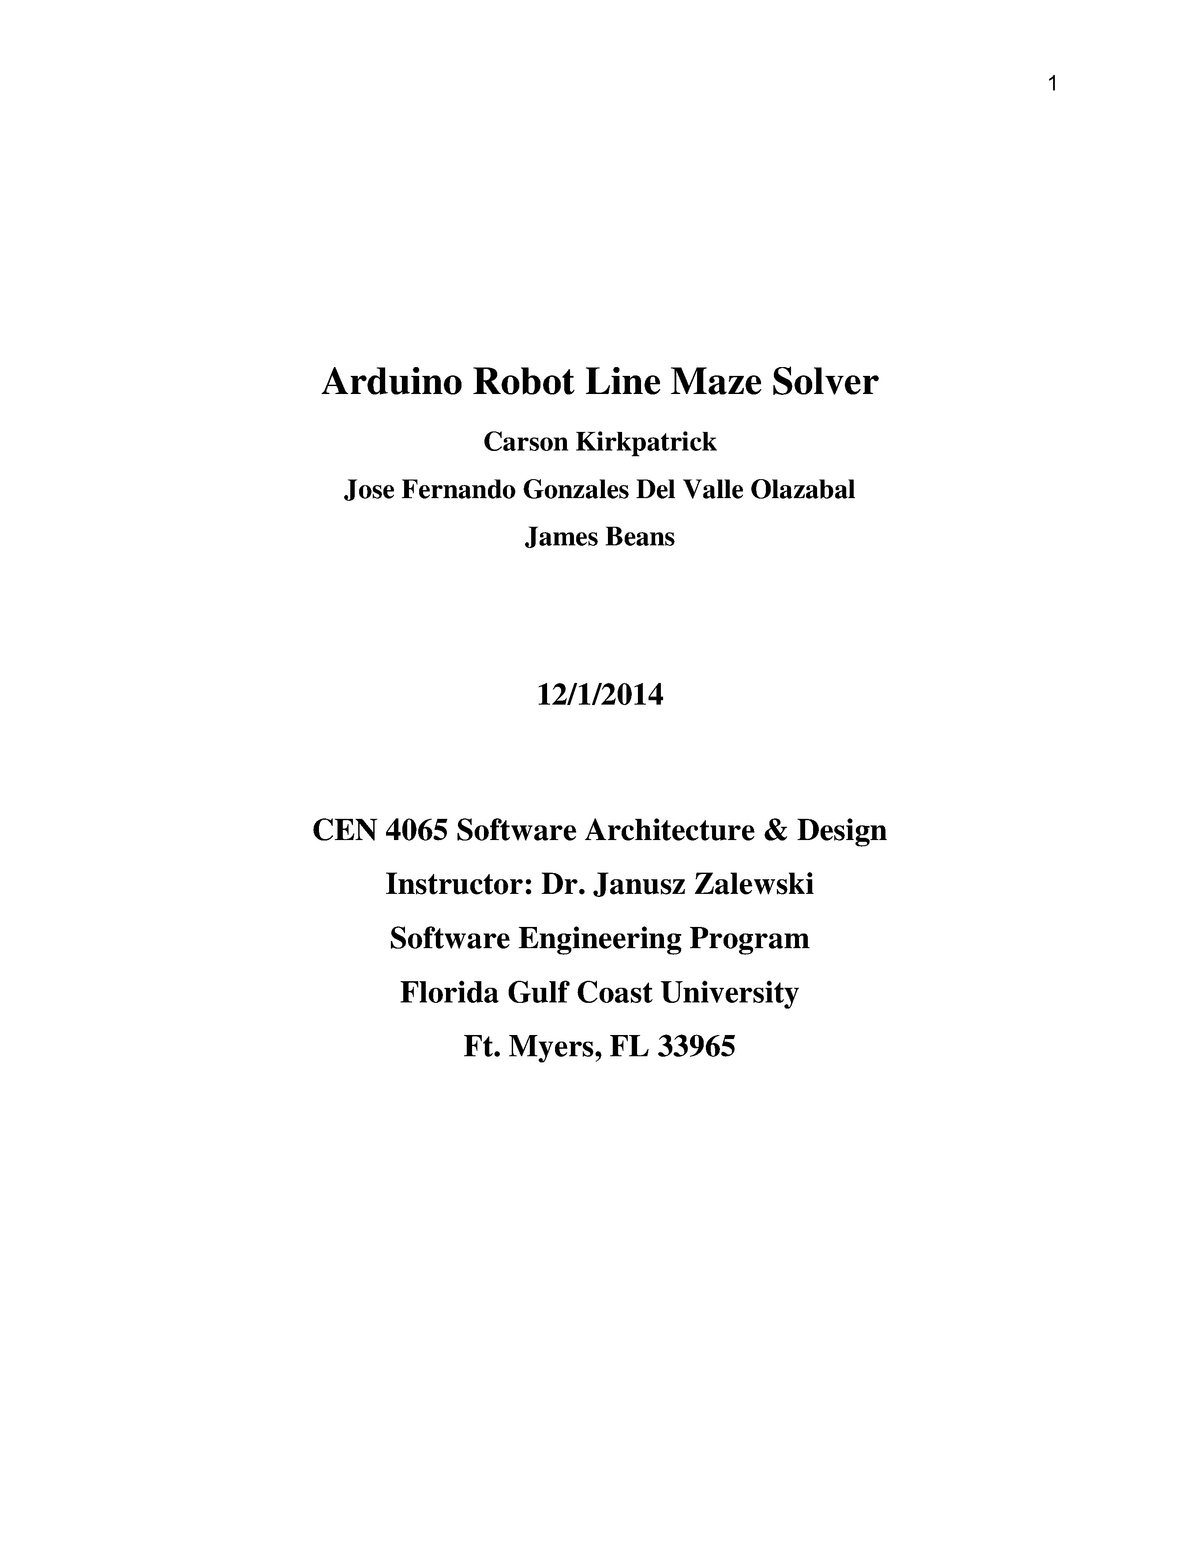 Arduino Robot Line Maze Solver Report - Taller De Tasacion - StuDocu